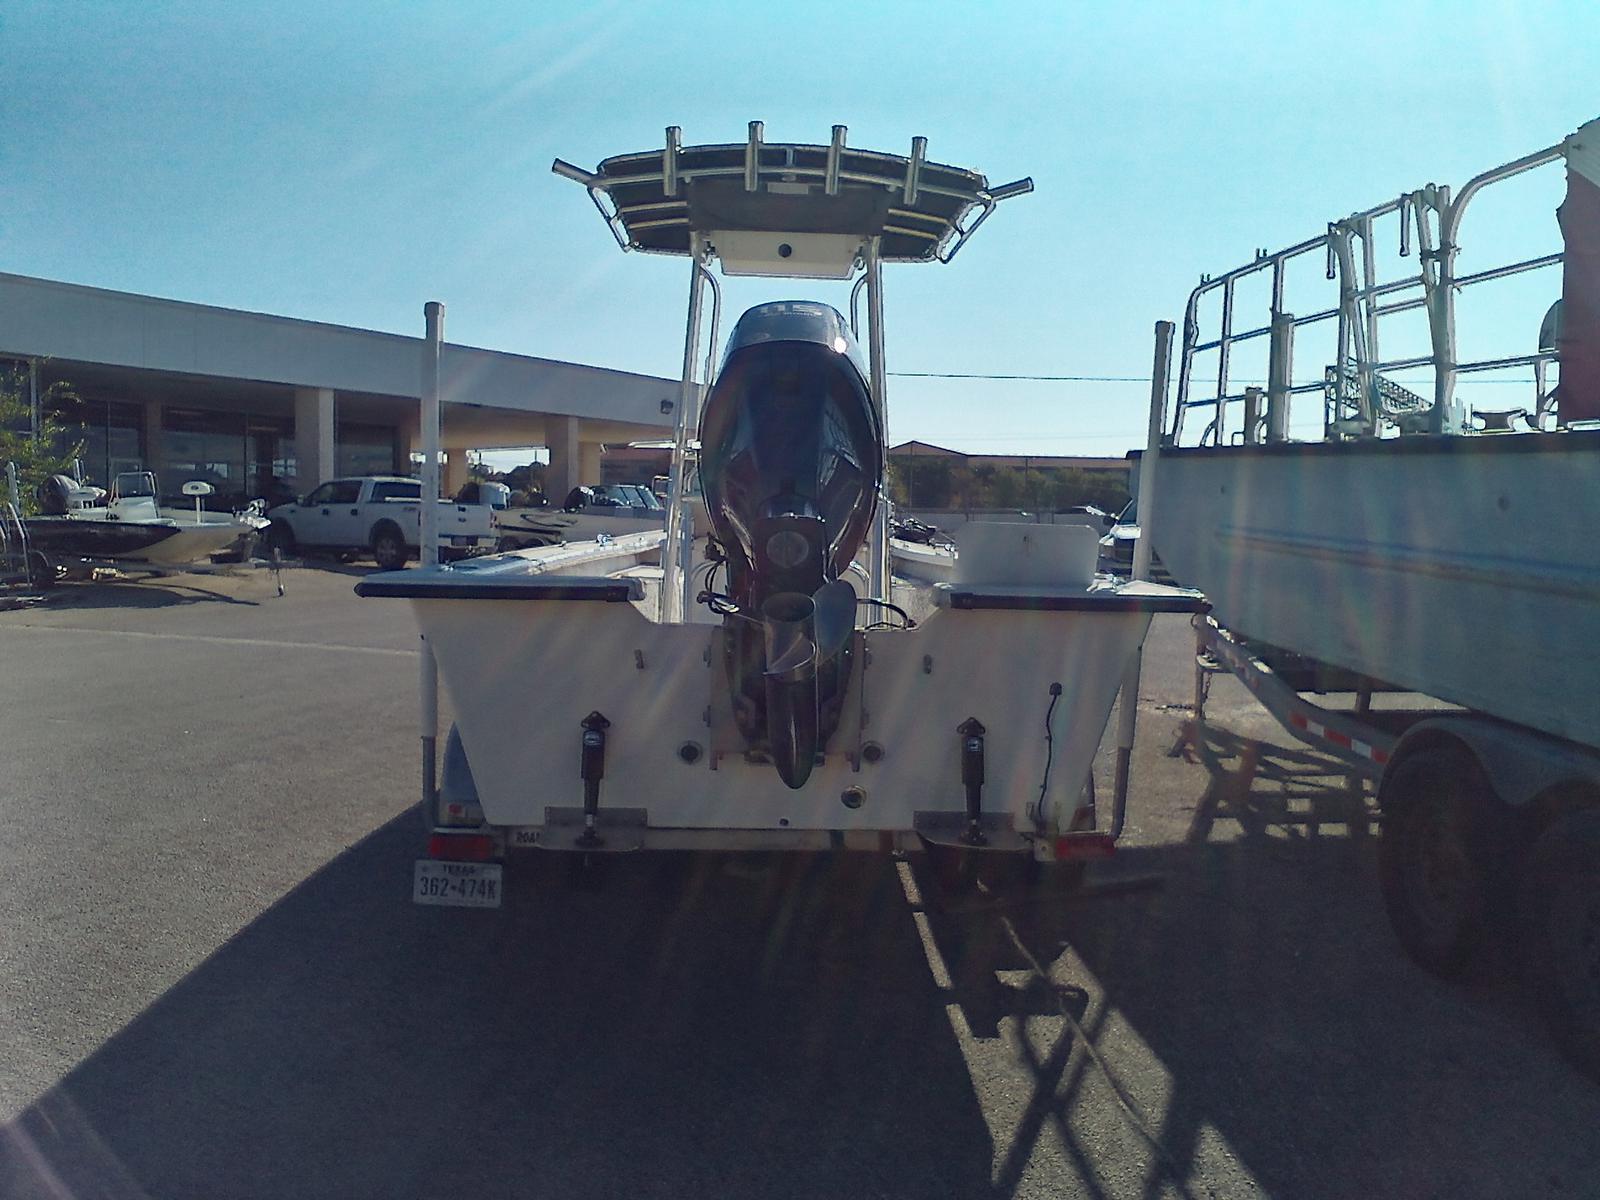 2008 Riddick boat for sale, model of the boat is Bay Runner 2290 & Image # 4 of 6